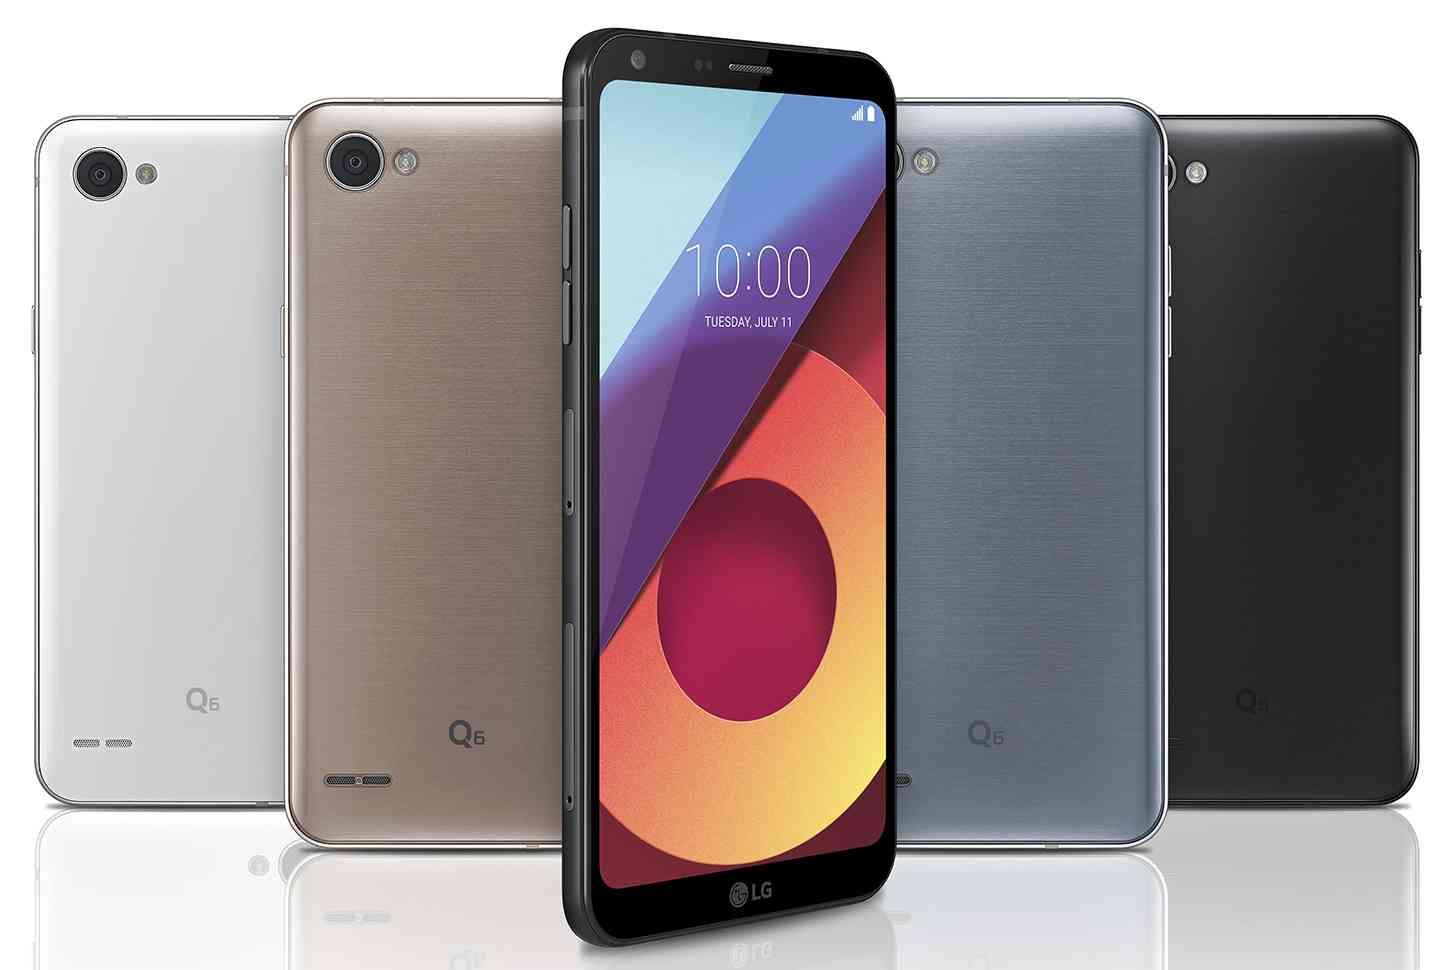 LG Q6 official